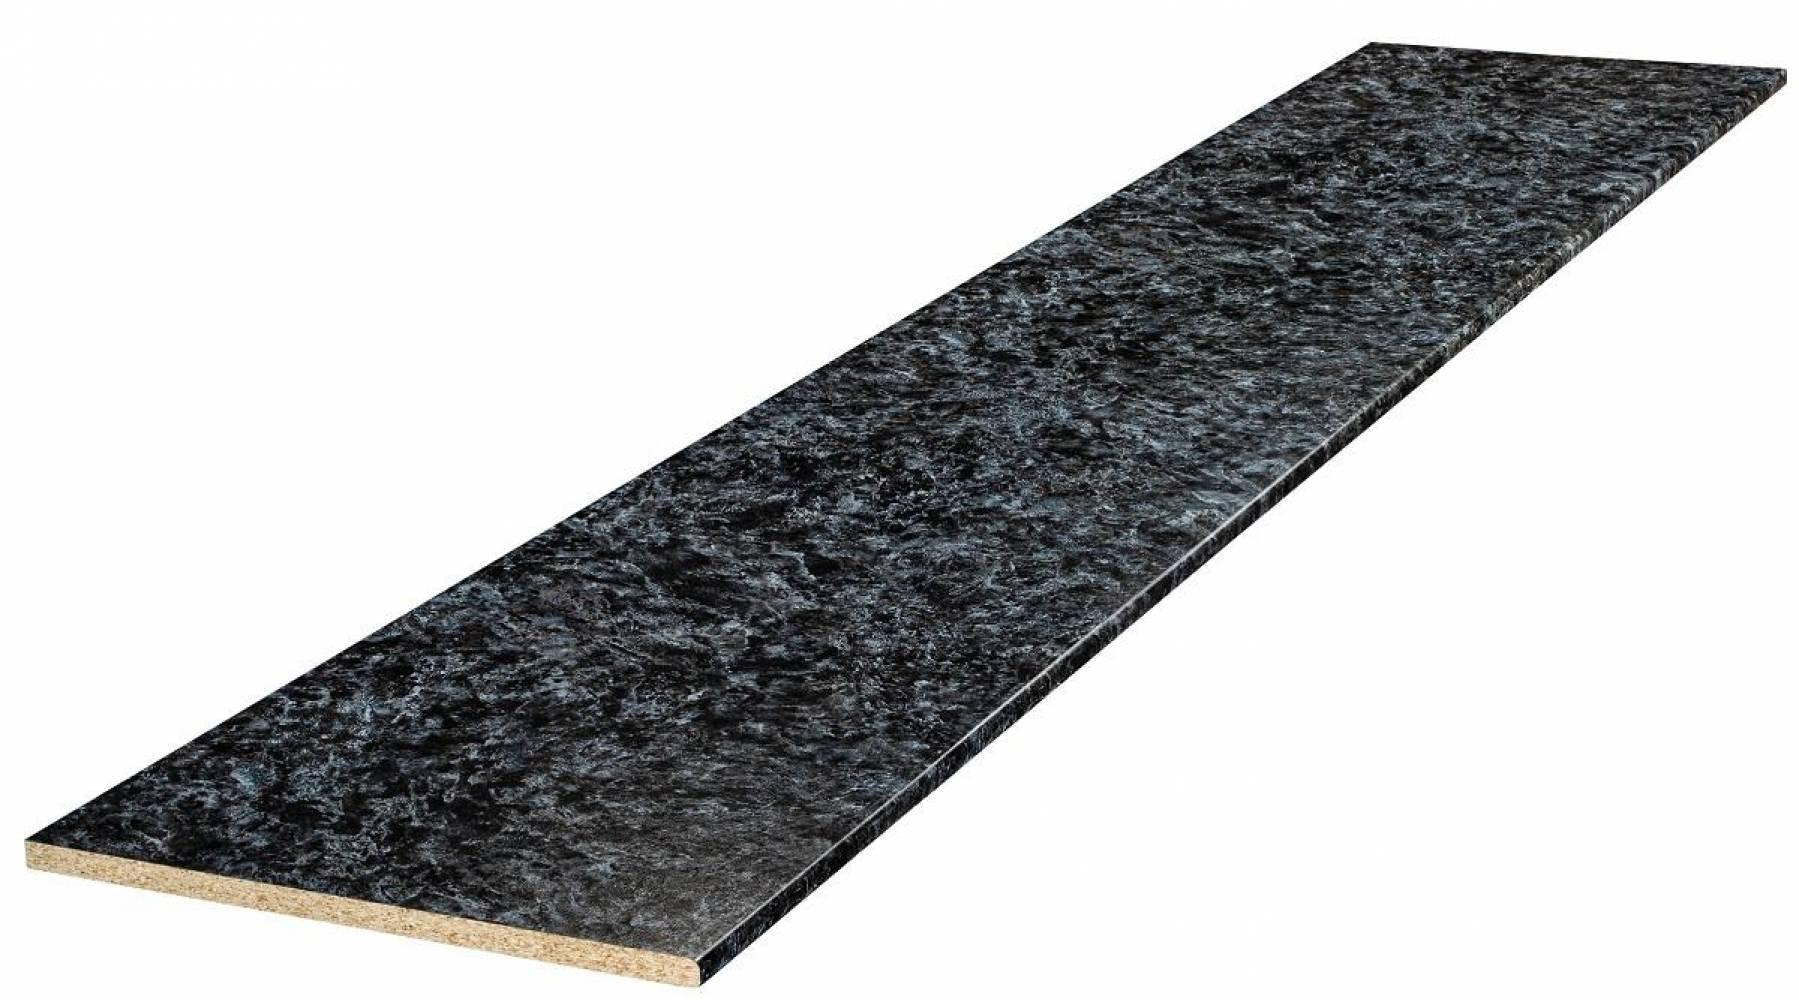 Столешница № 46 Т Кастилло темный 26 мм Матовая Скиф, цена  за пог/метр